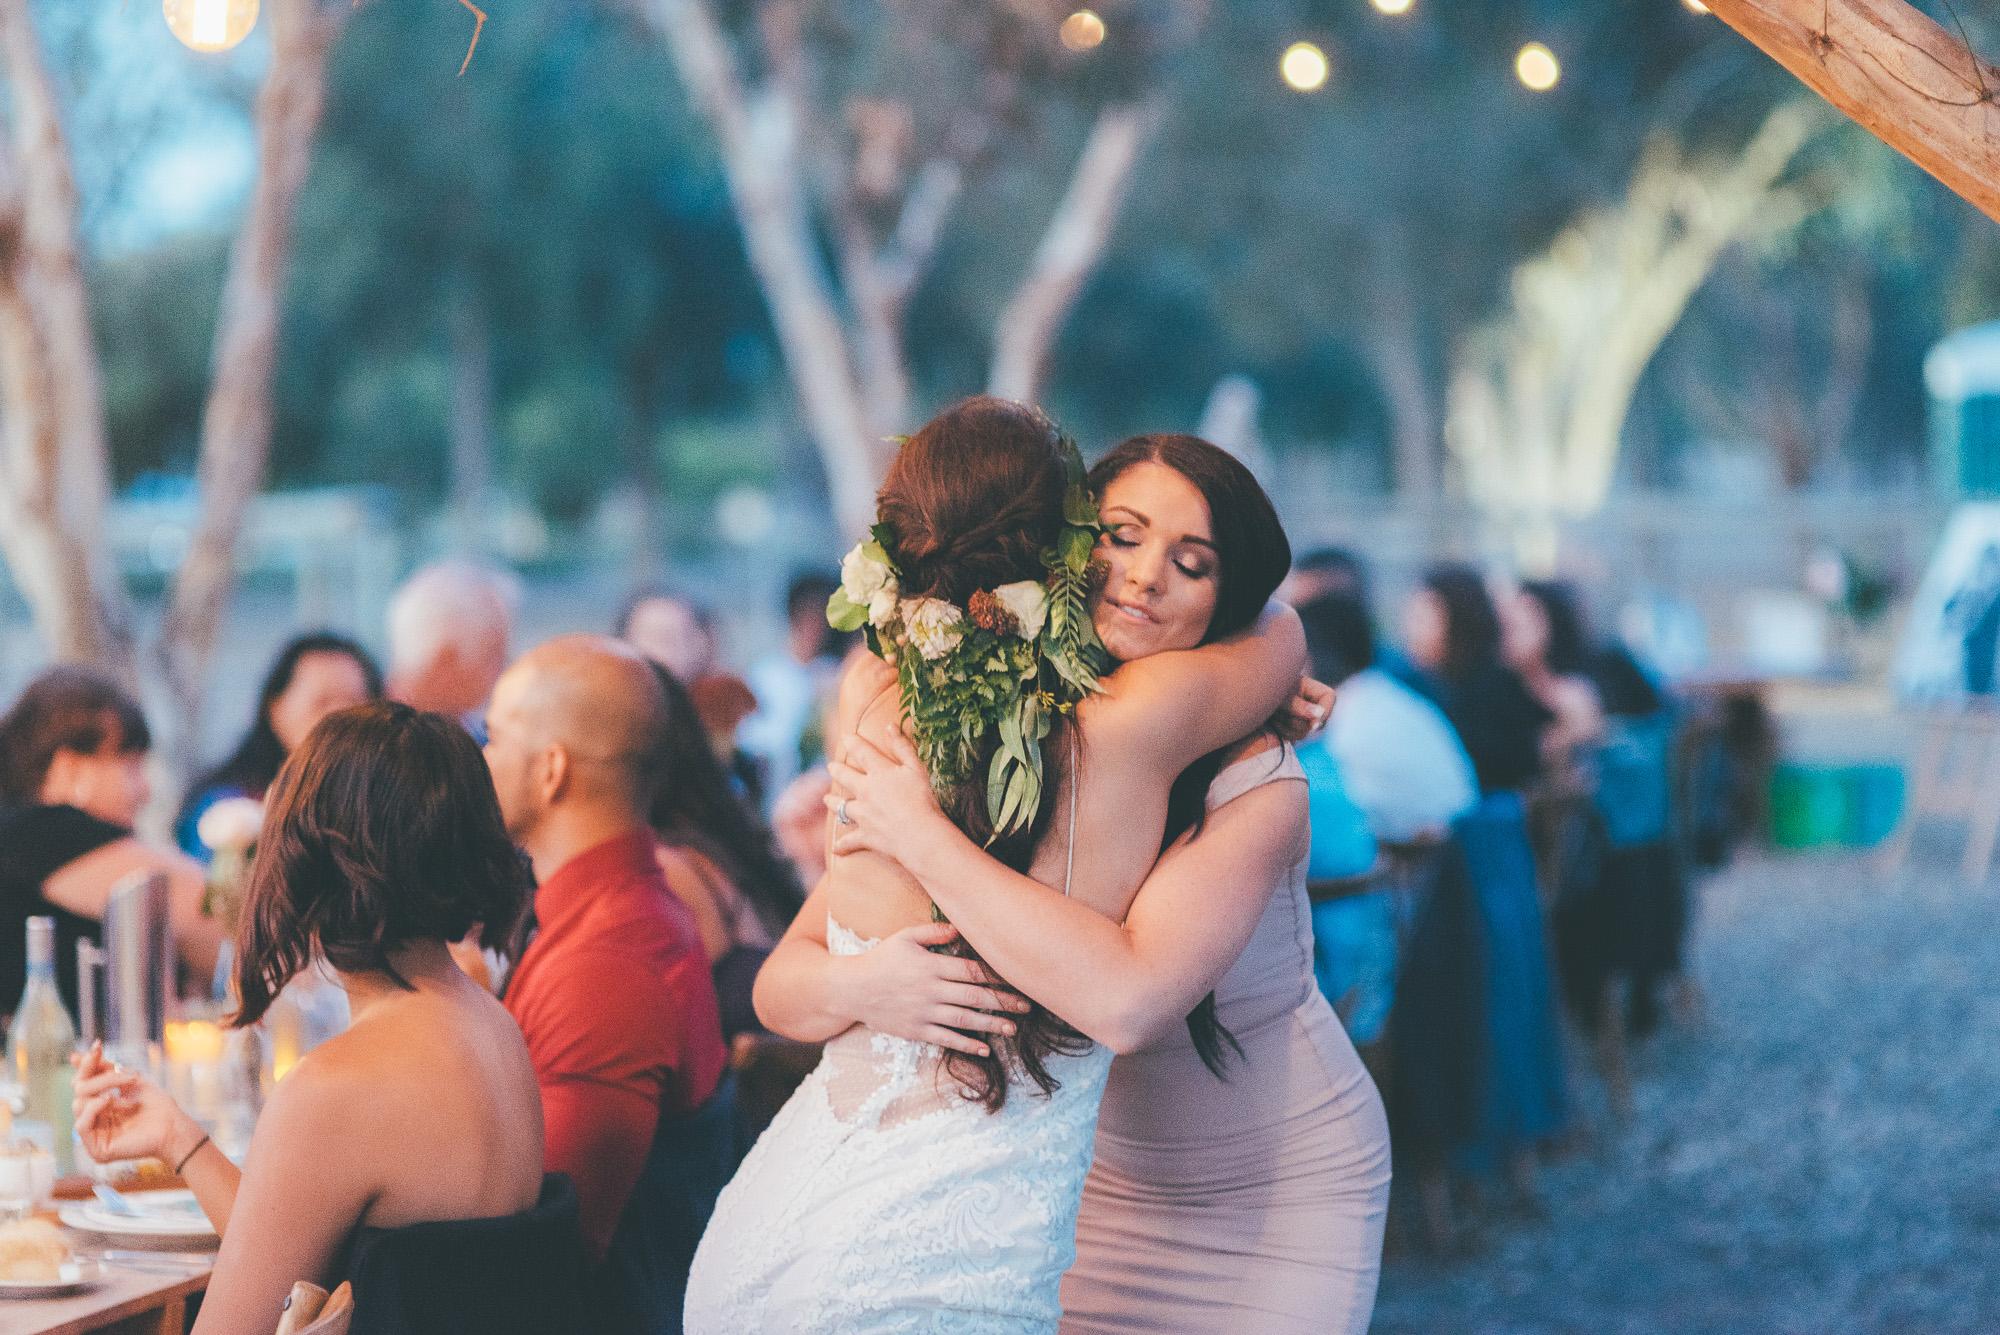 wedding-photographer-outdoor-casual-styled-los-angeles-australia-california-international-earthbound -90.jpg